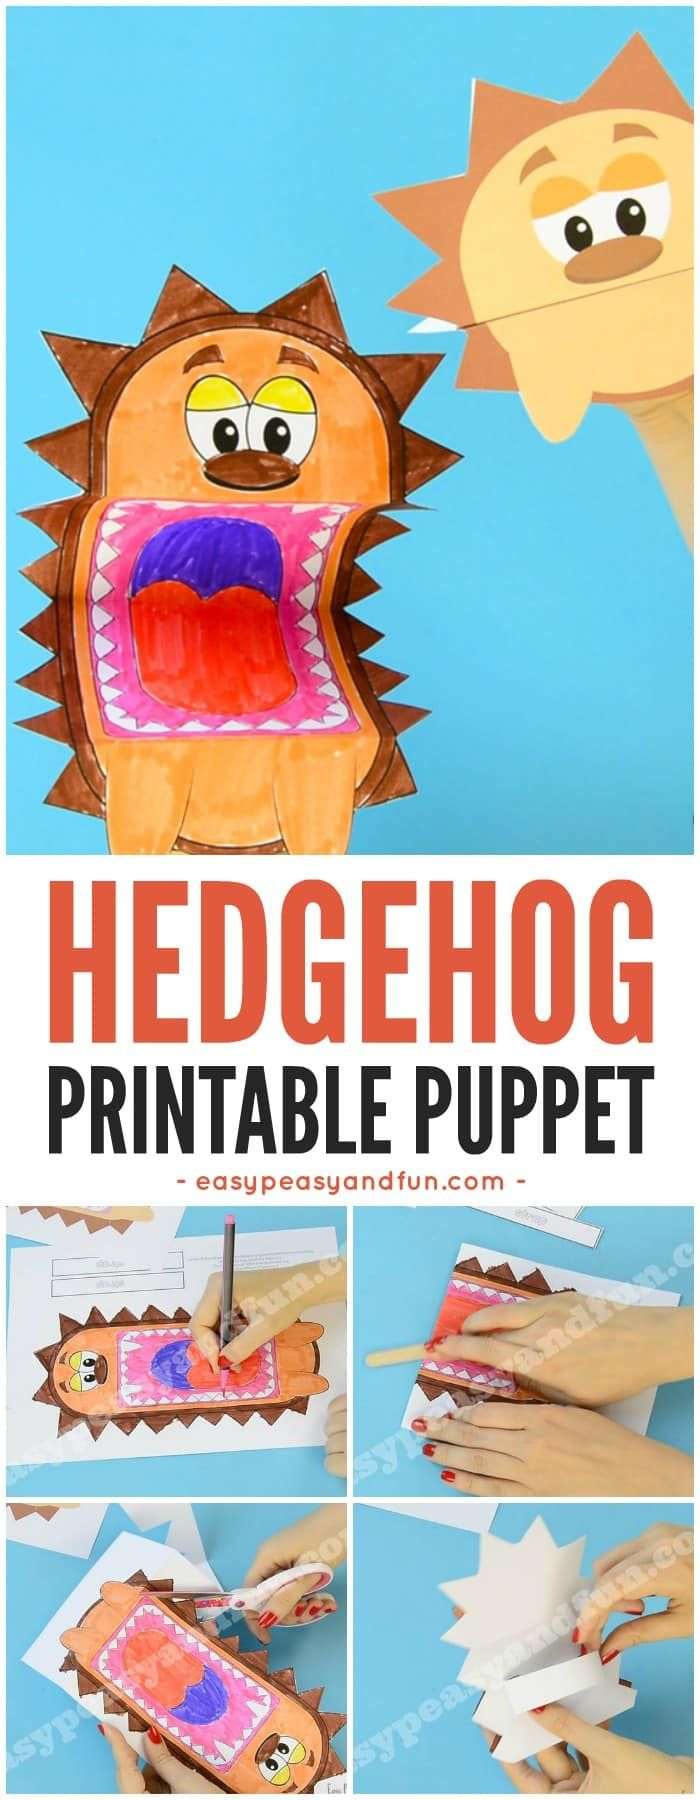 Printable Hedgehog Puppet Template Craft for Kids